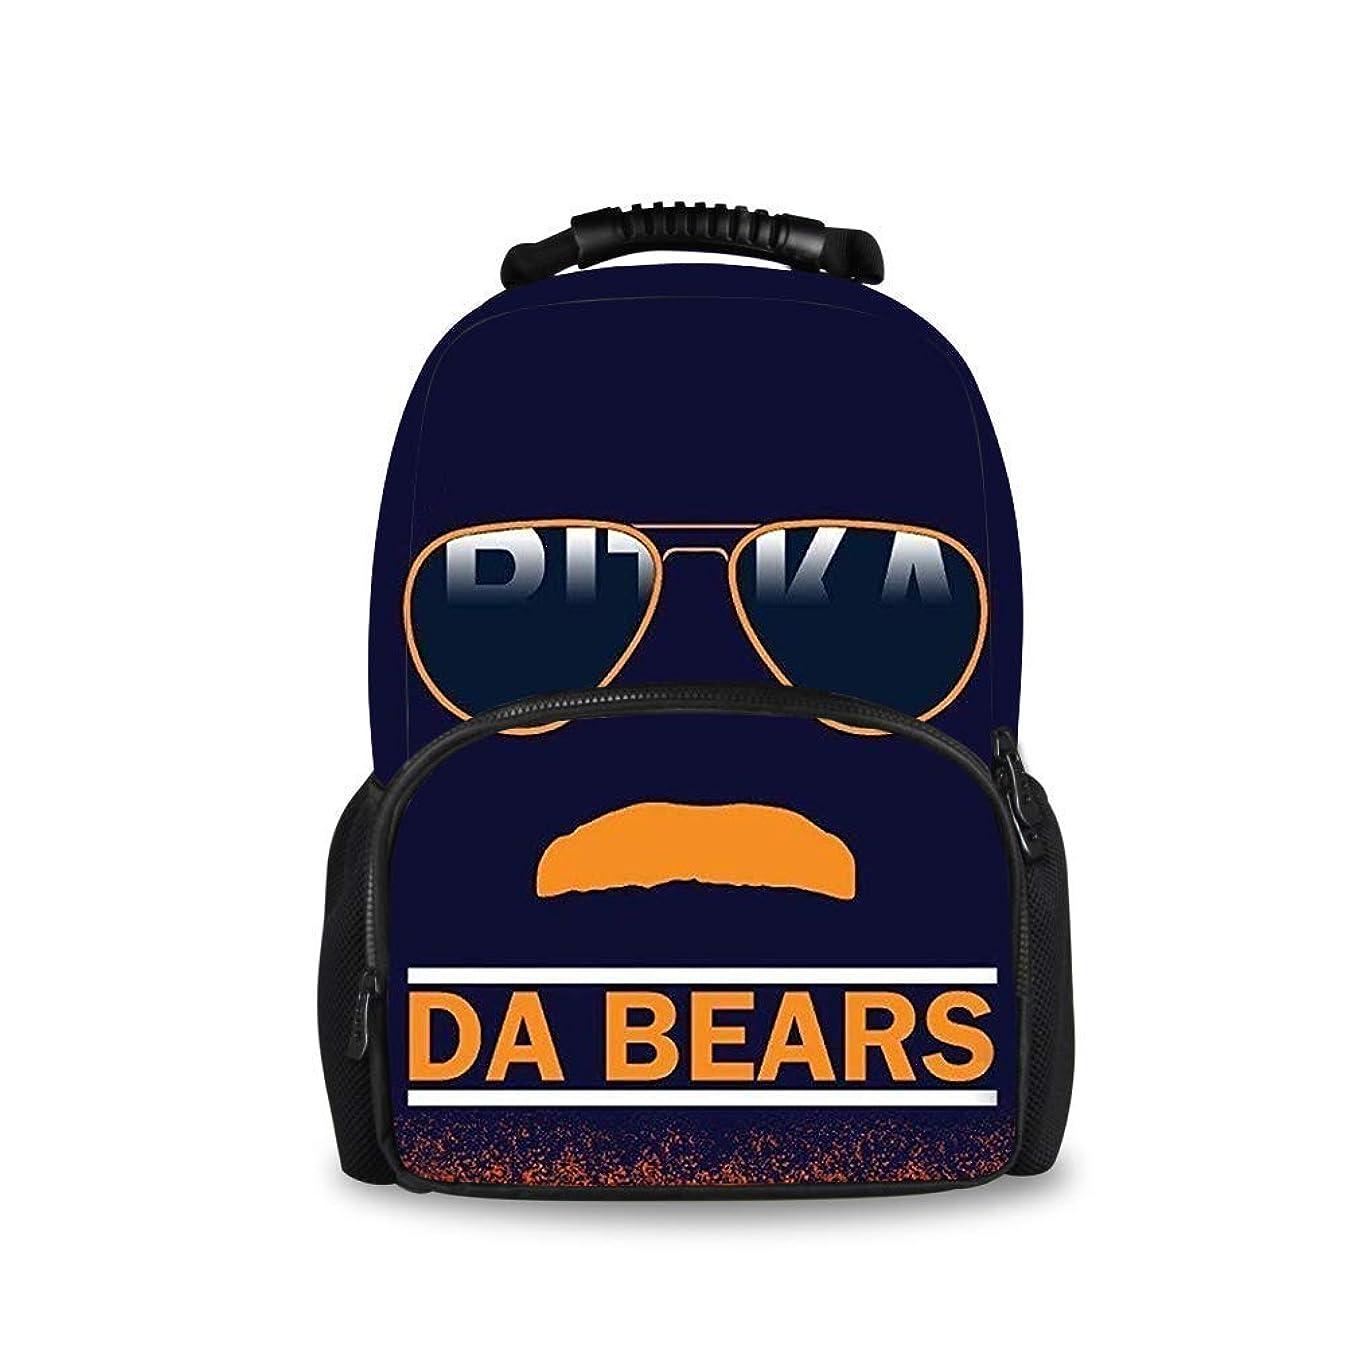 Da Bears Chicago Windy City Mustache Glasses Rucksack, Big Capacity Carry On Bag Travel Hiking Daypack, College School Bookbag Gym Outdoor Hiking Bag Laptop Book Bag Rucksack